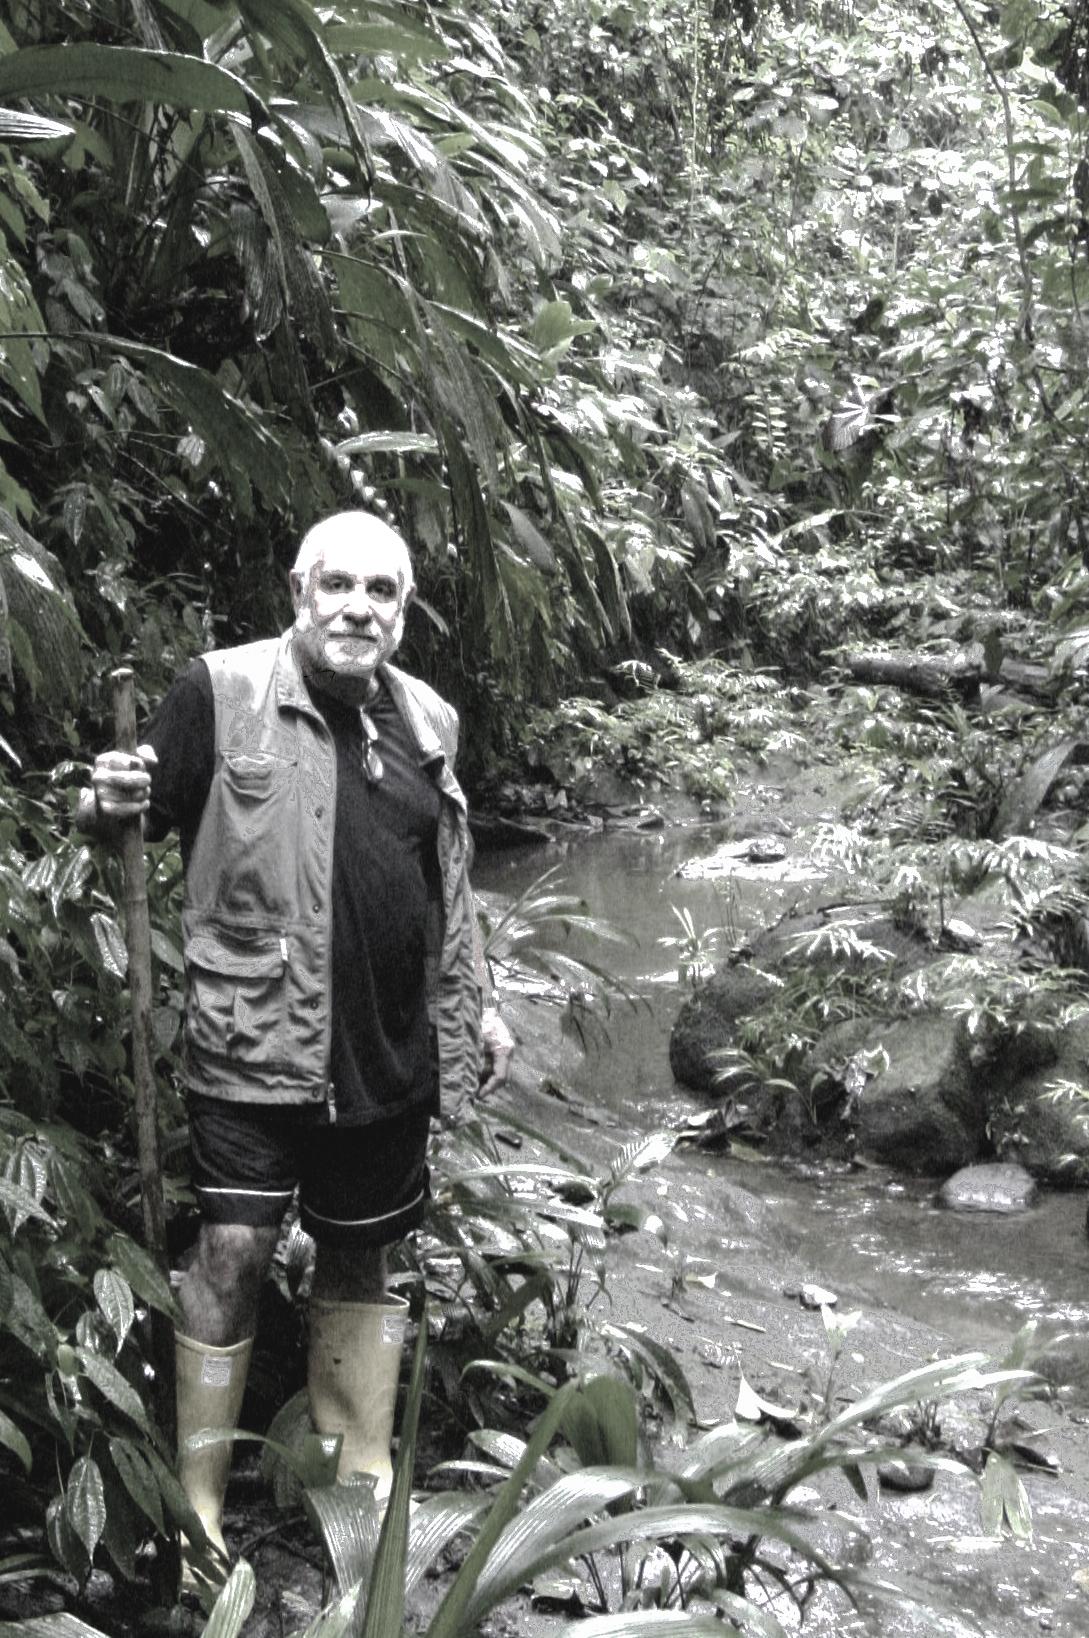 Manantial de Monte Saino - Esmeraldas - Ecuador (2008)